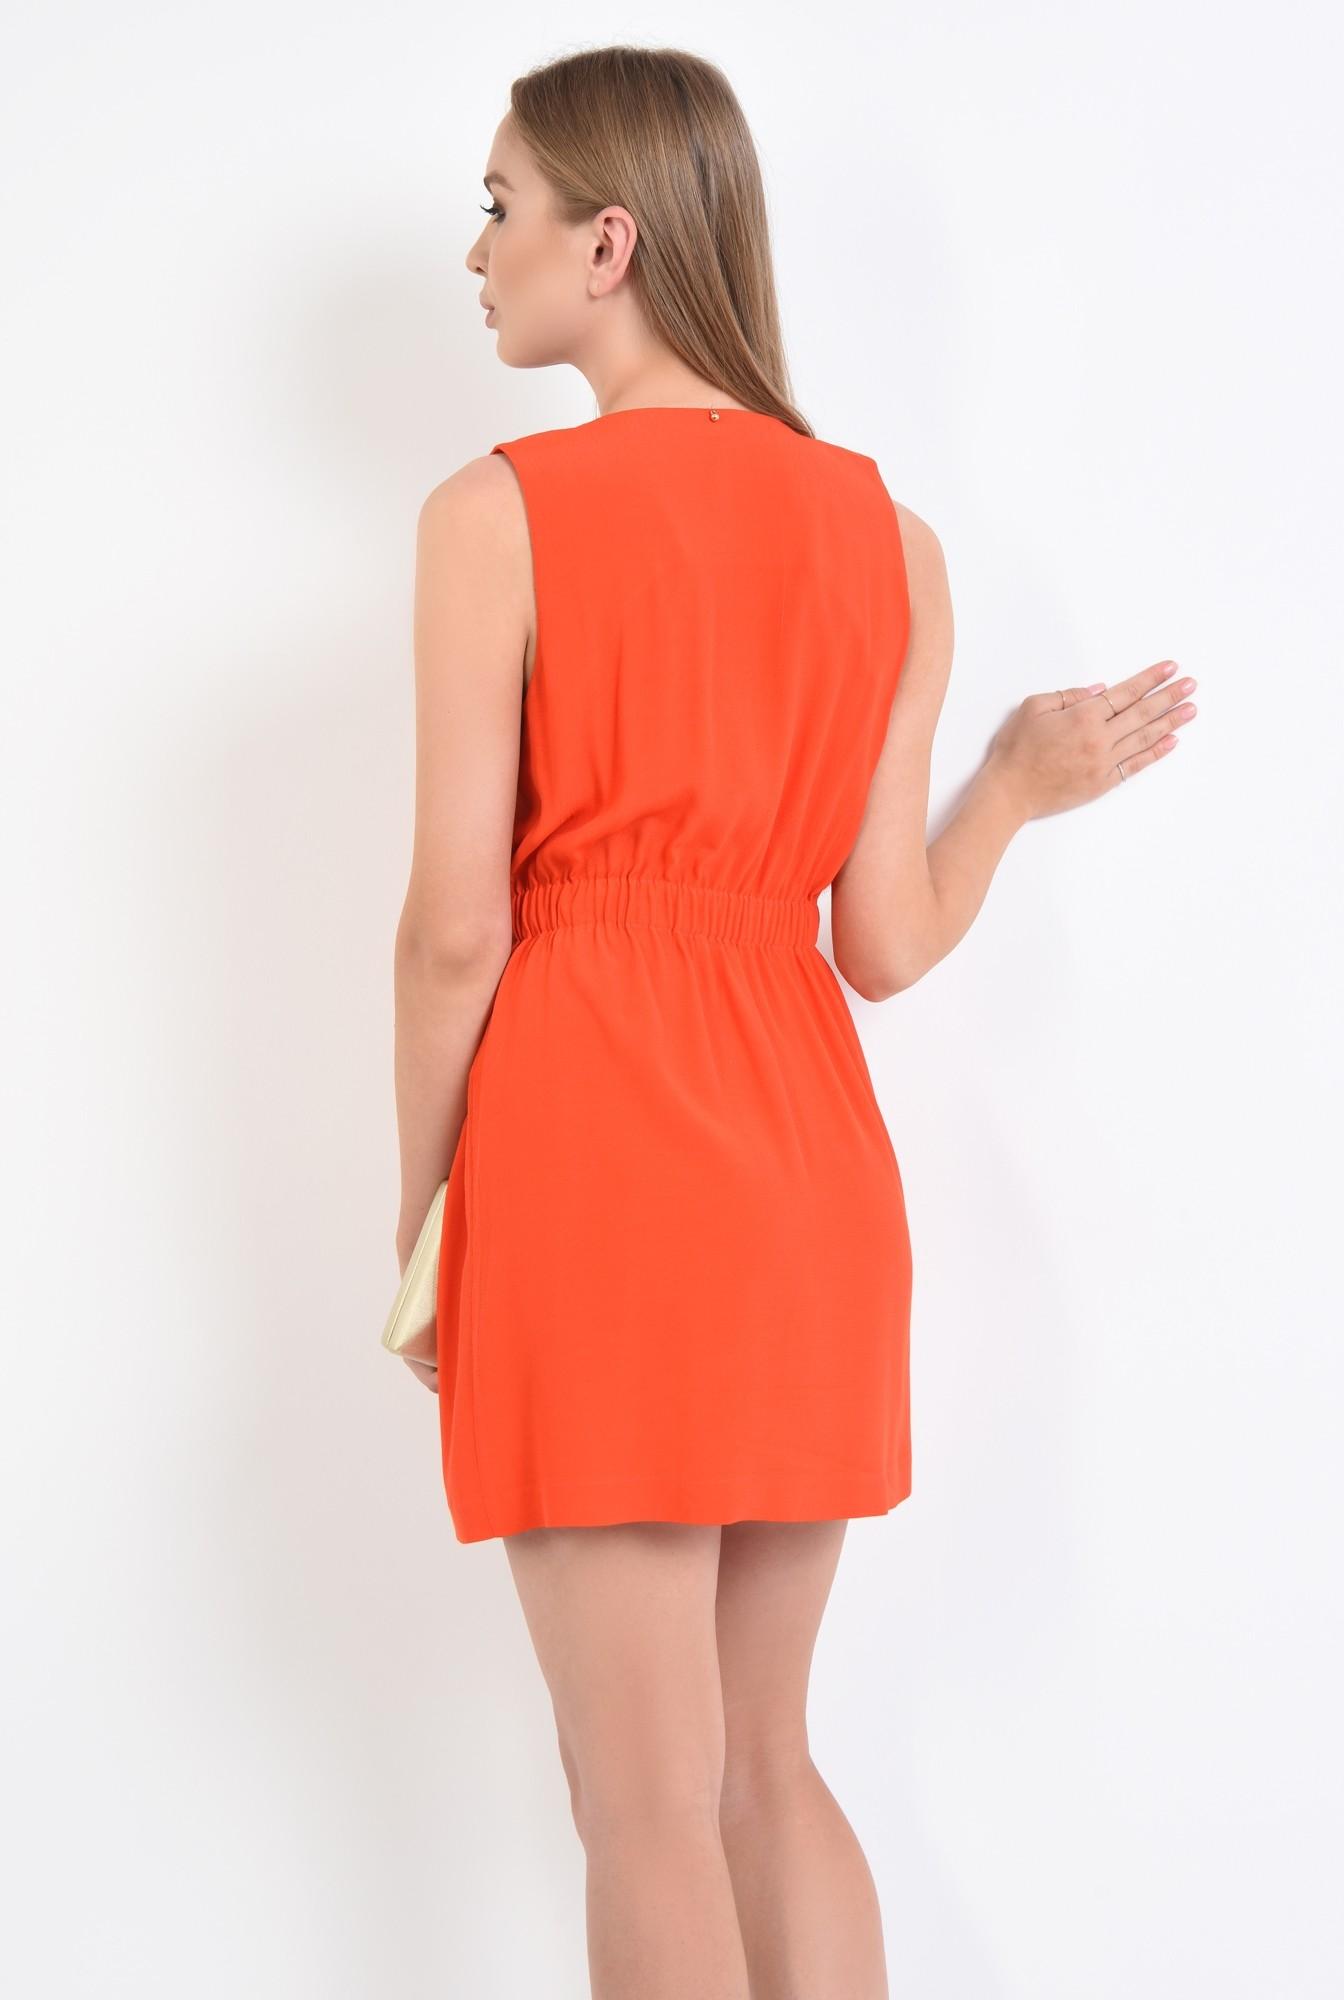 1 - rochie eleganta, corai, petrecuta, nasturi, decolteu, anchior, scurta